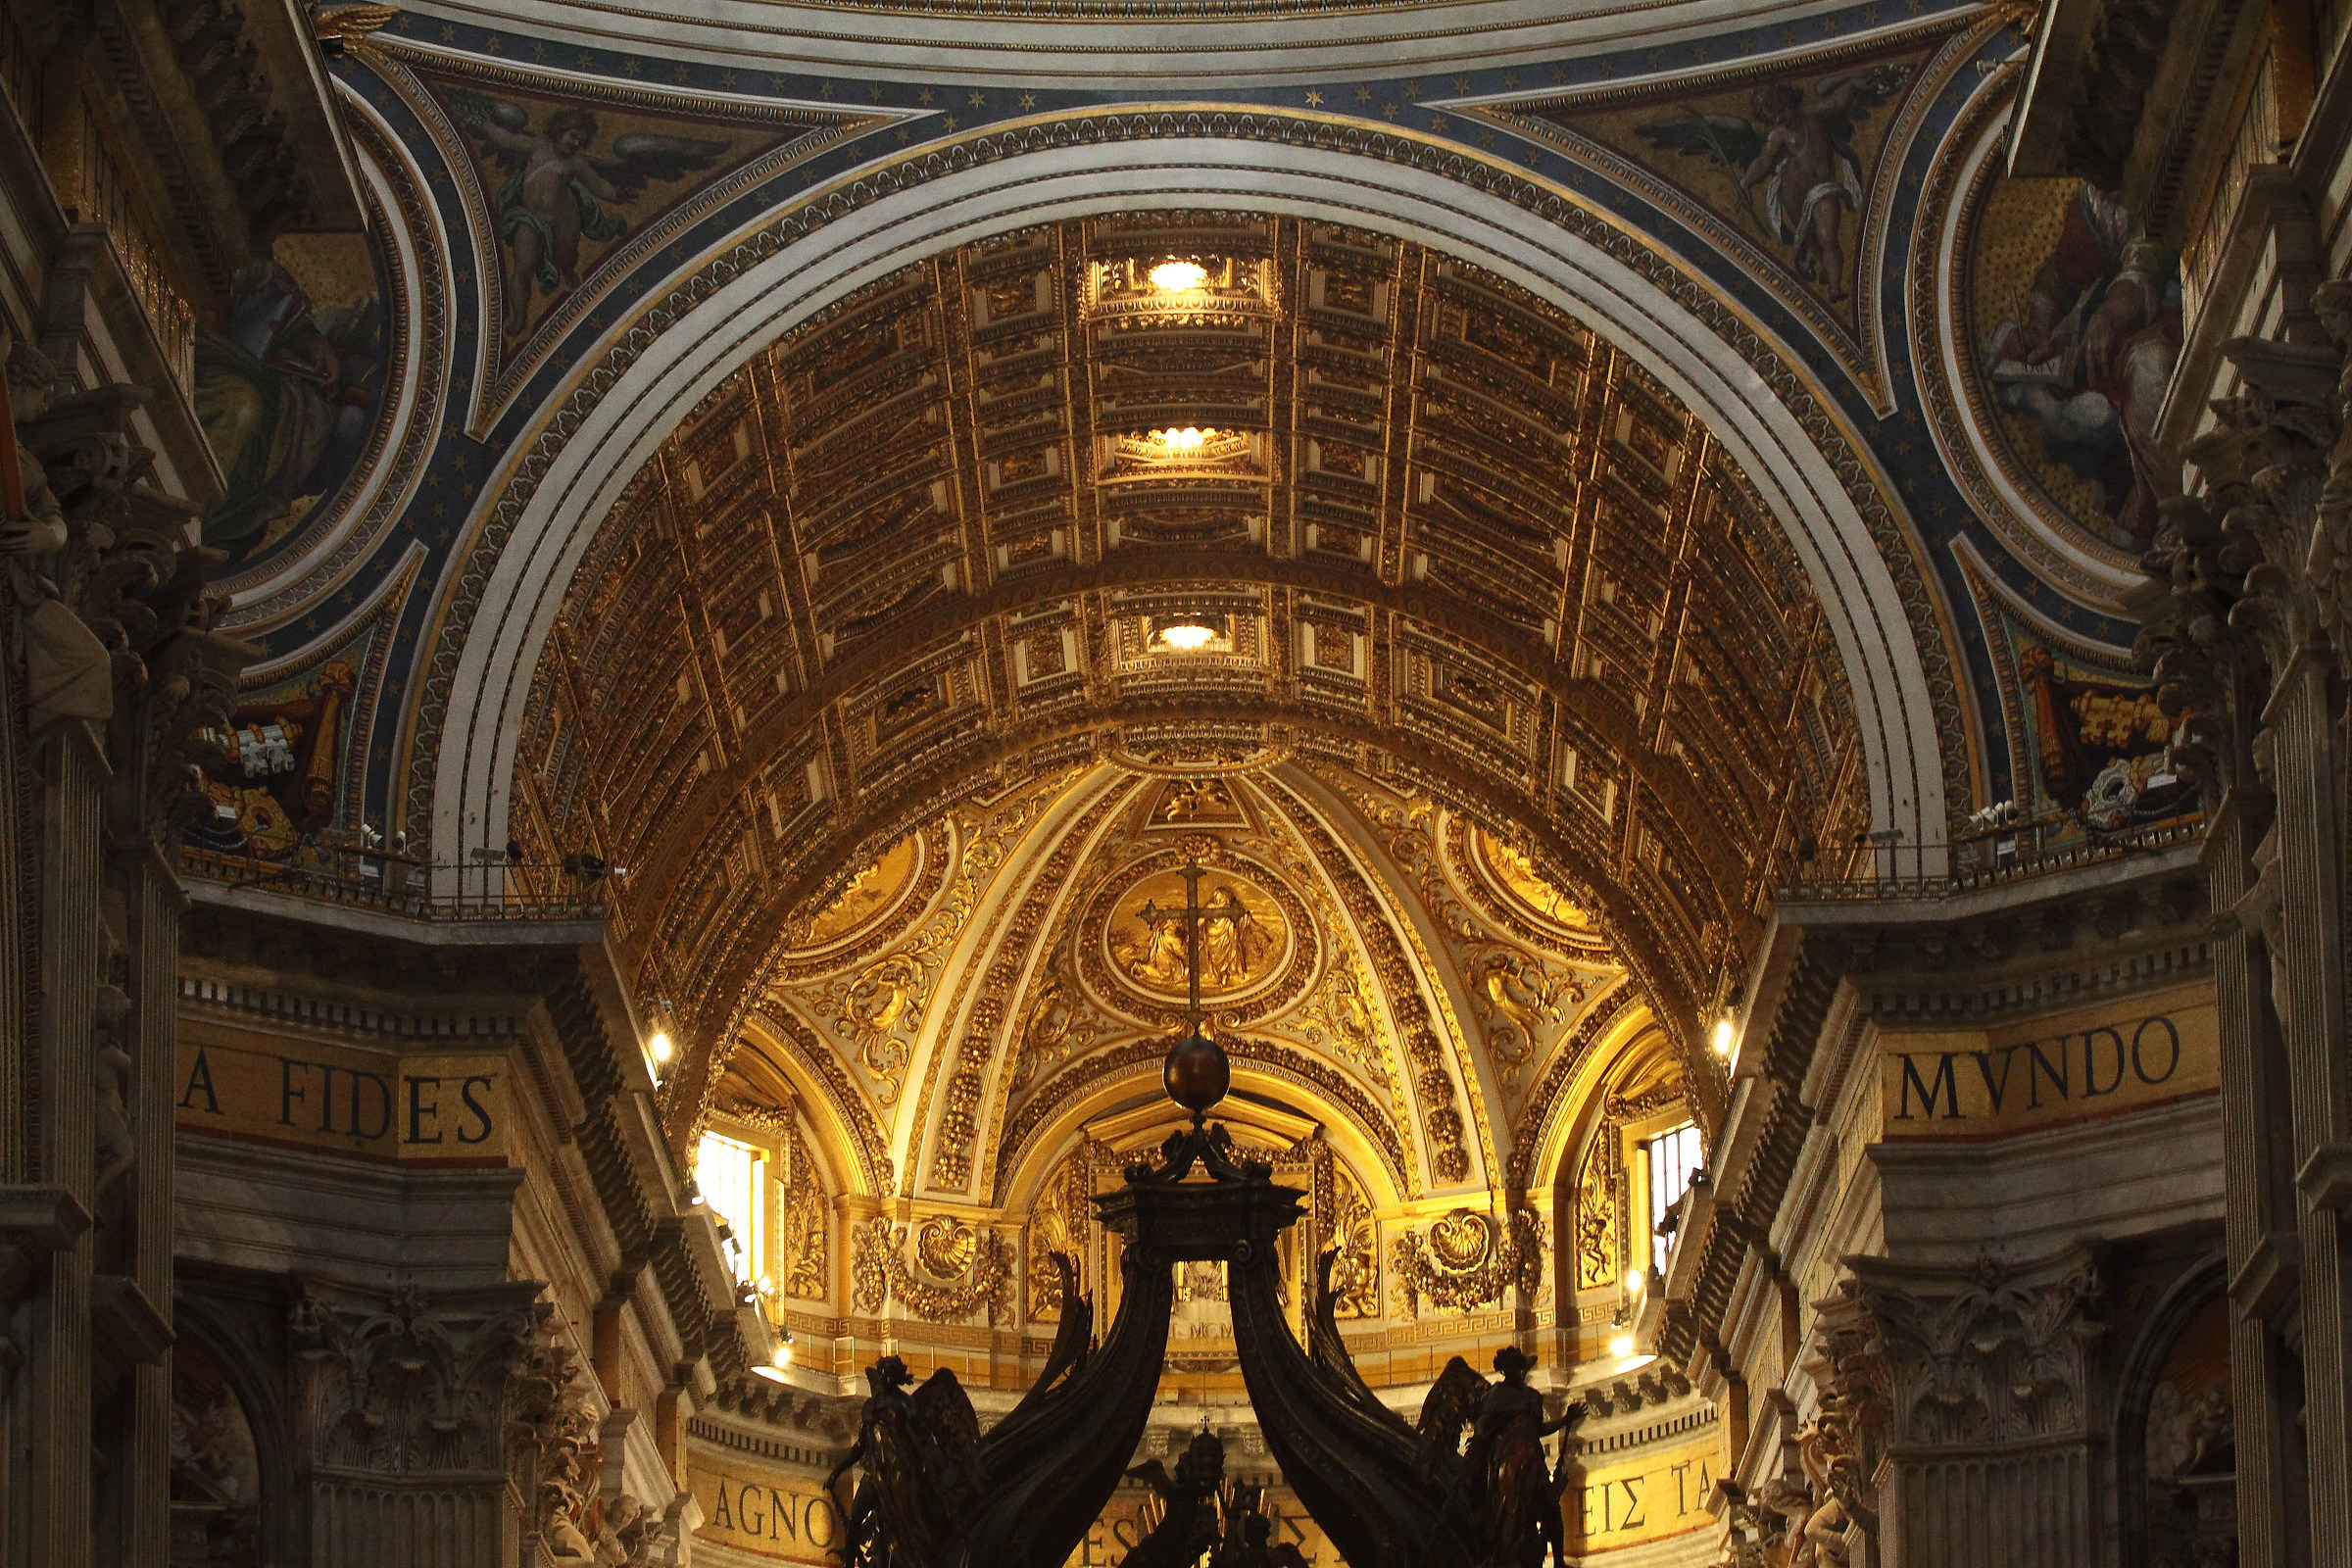 St. Peter's Basilica, interior...